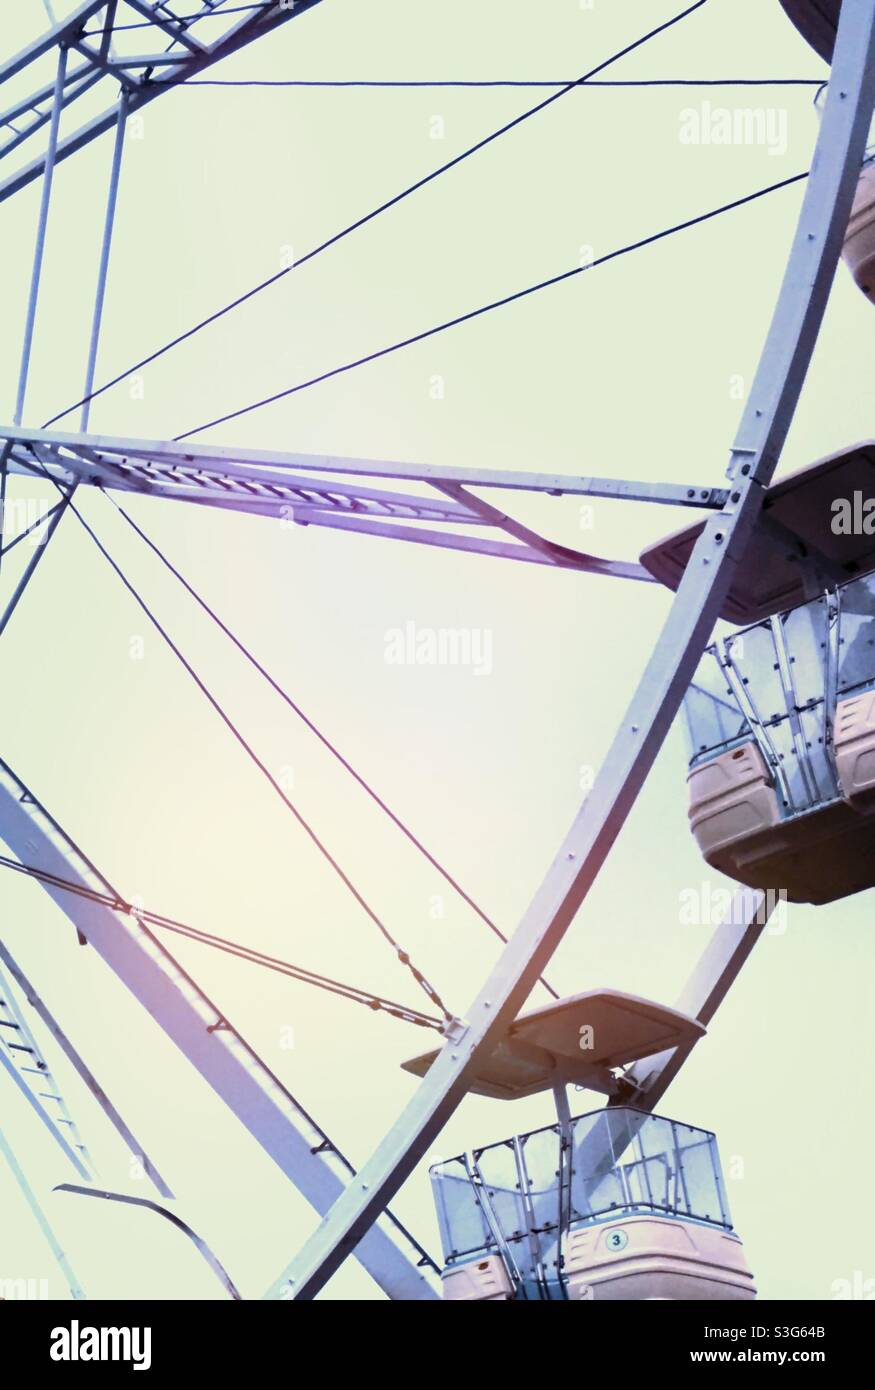 Großes Rad (Riesenrad) Stockfoto